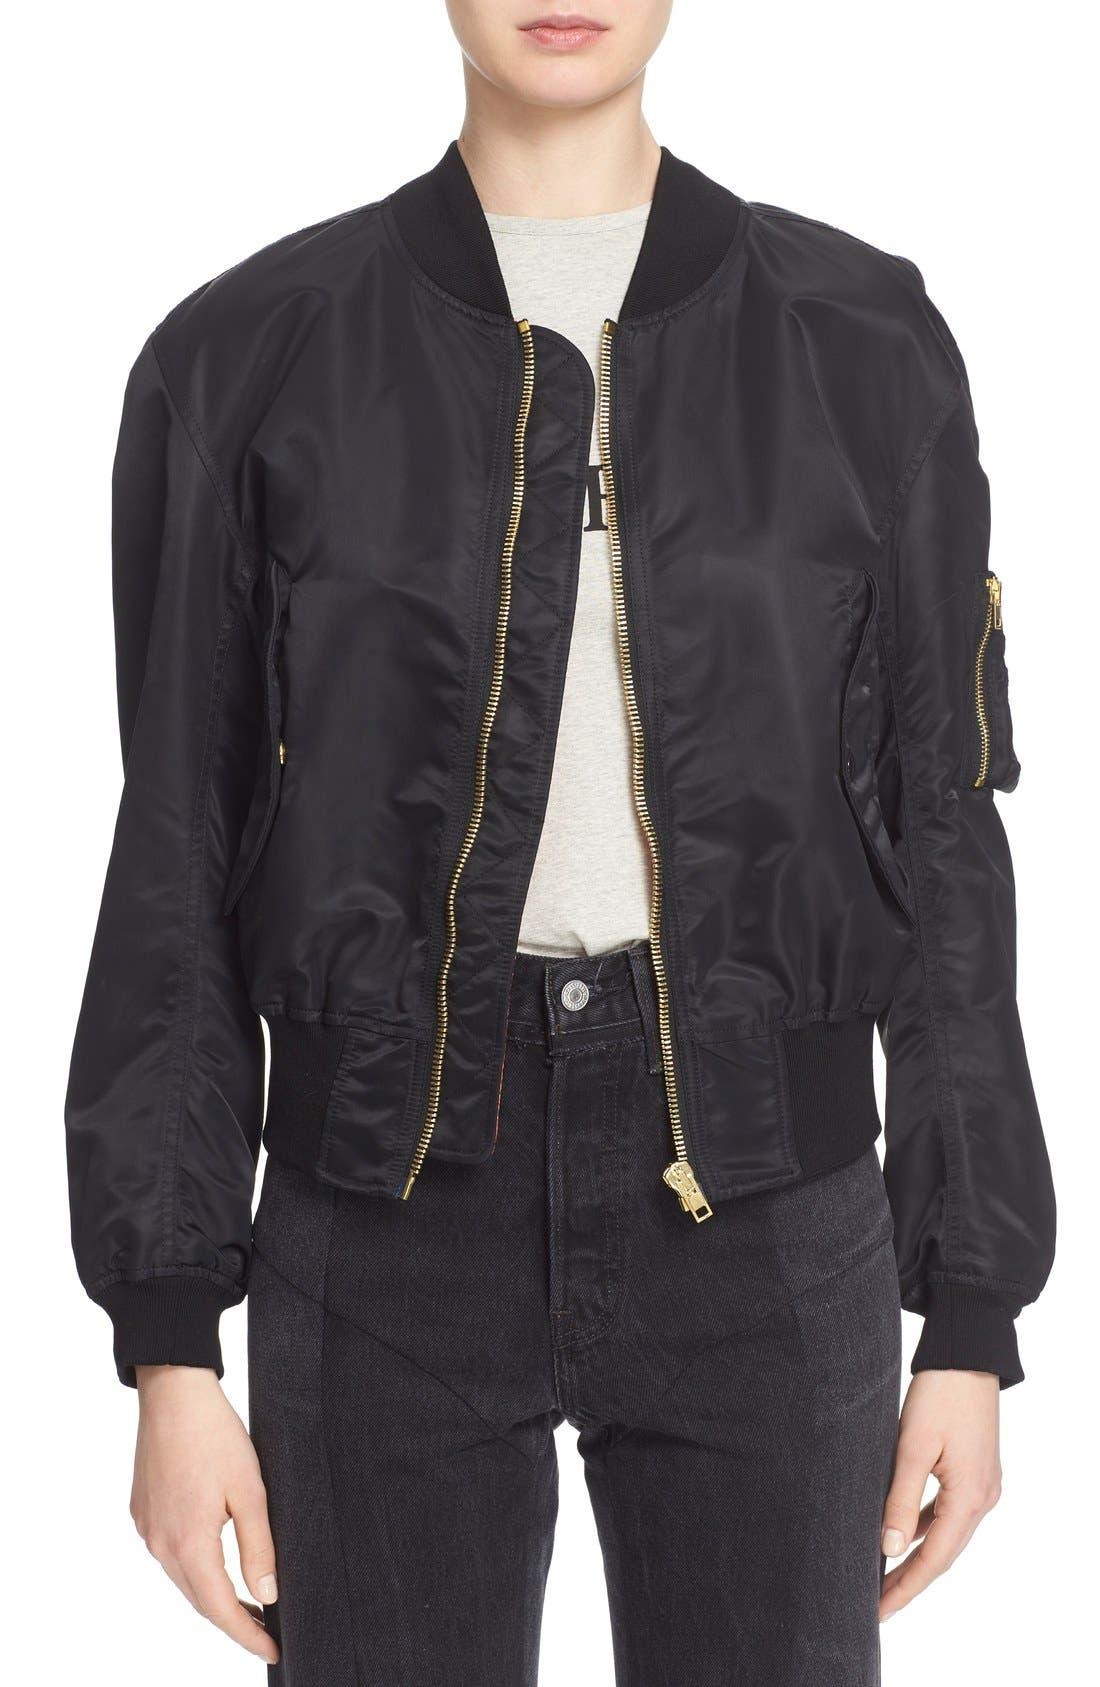 Alternate Image 1 Selected - Vetements Nylon Bomber Jacket